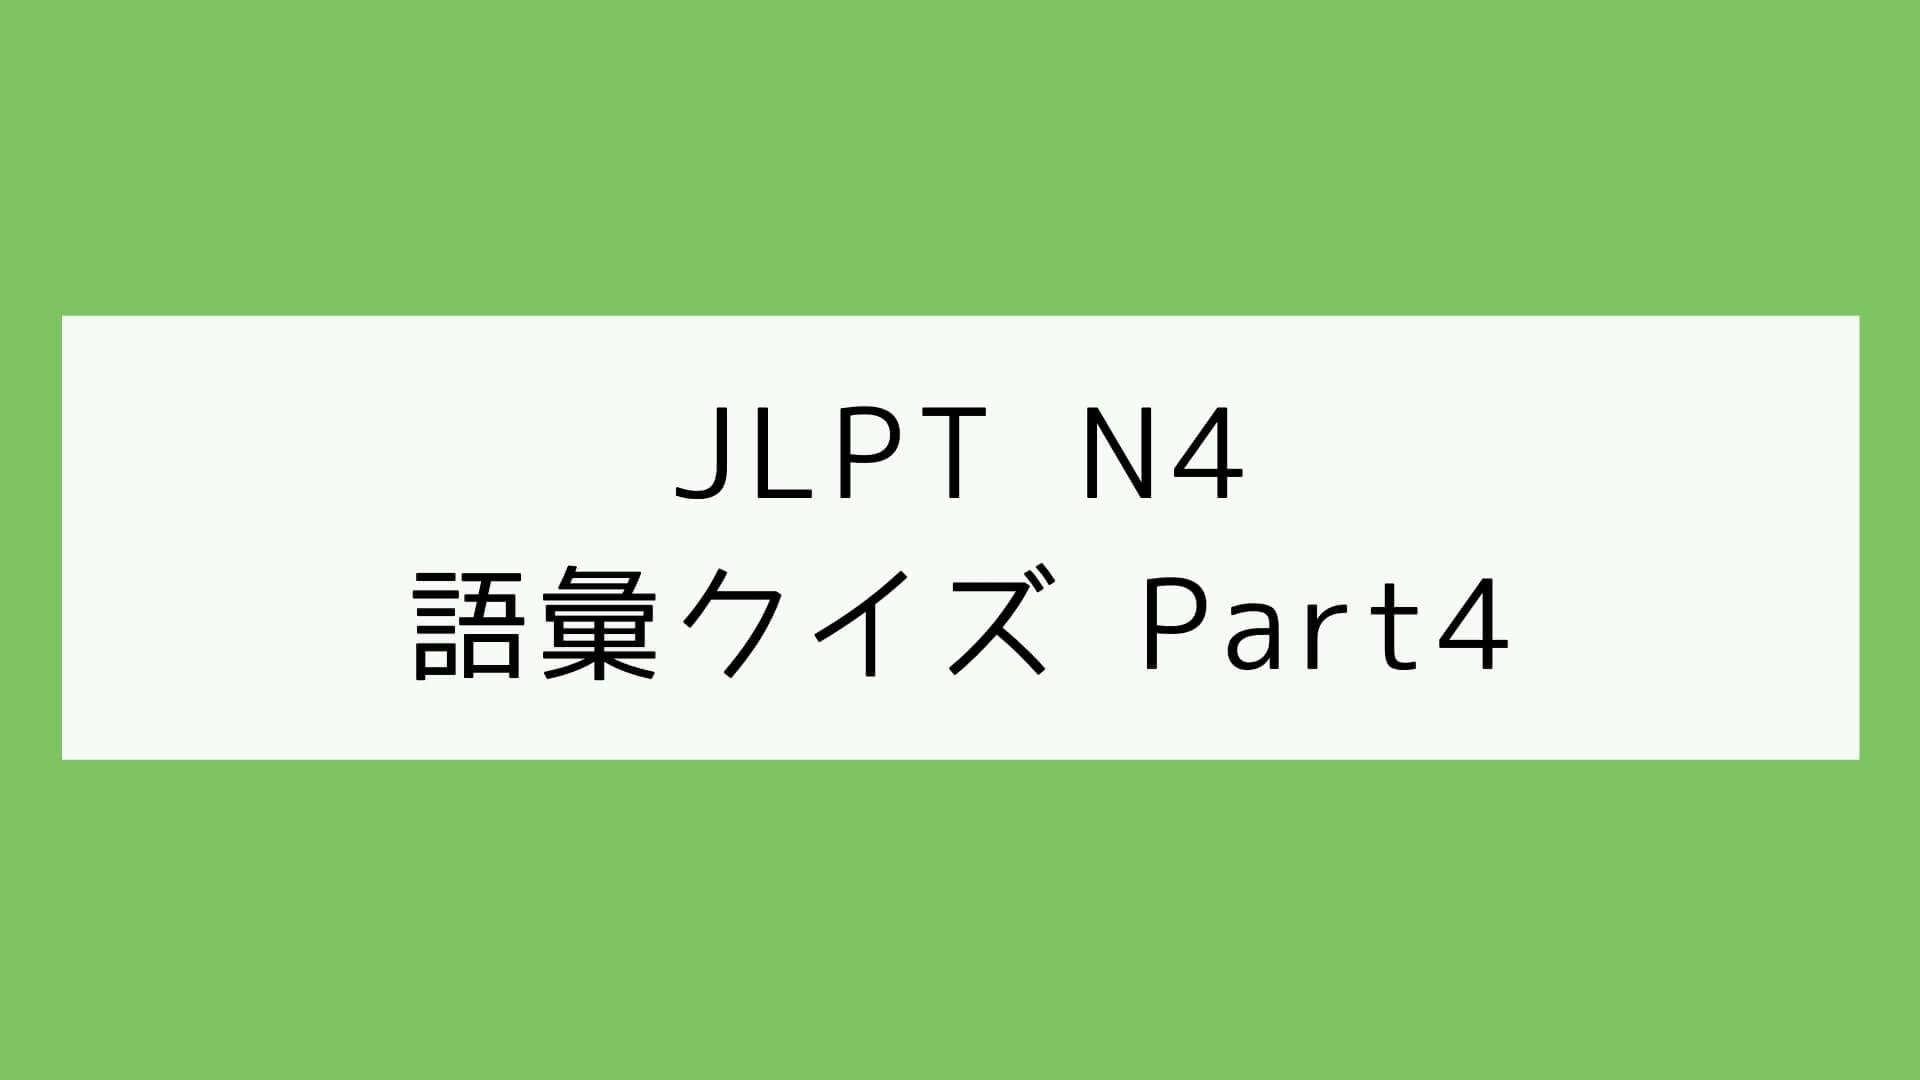 【JLPT N4】語彙クイズ Part4